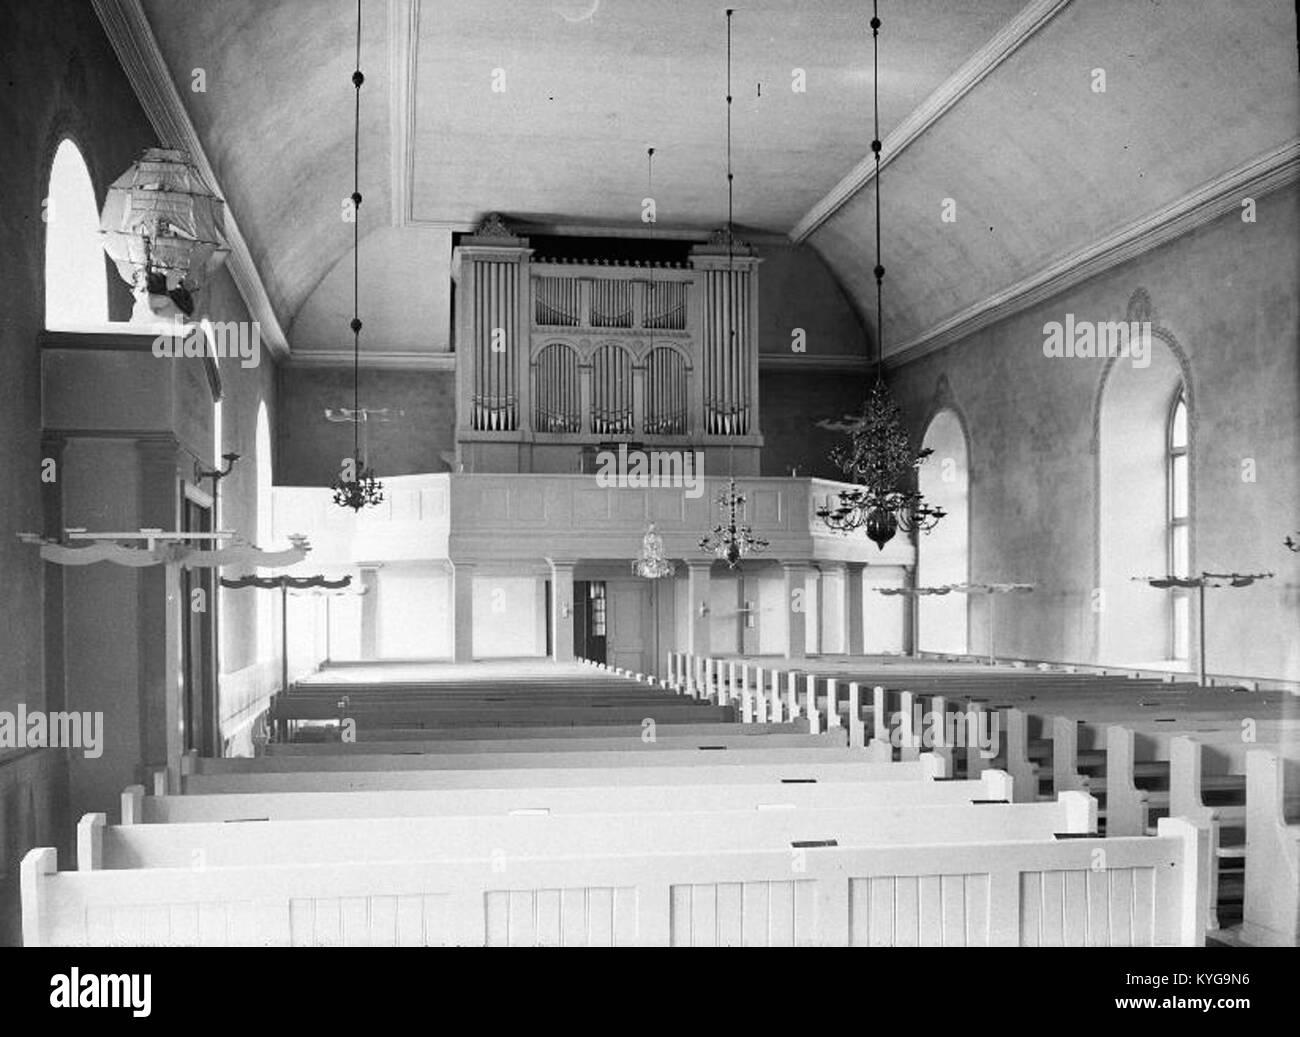 Rådmansö kyrka - KMB - 16000200127813 Foto Stock